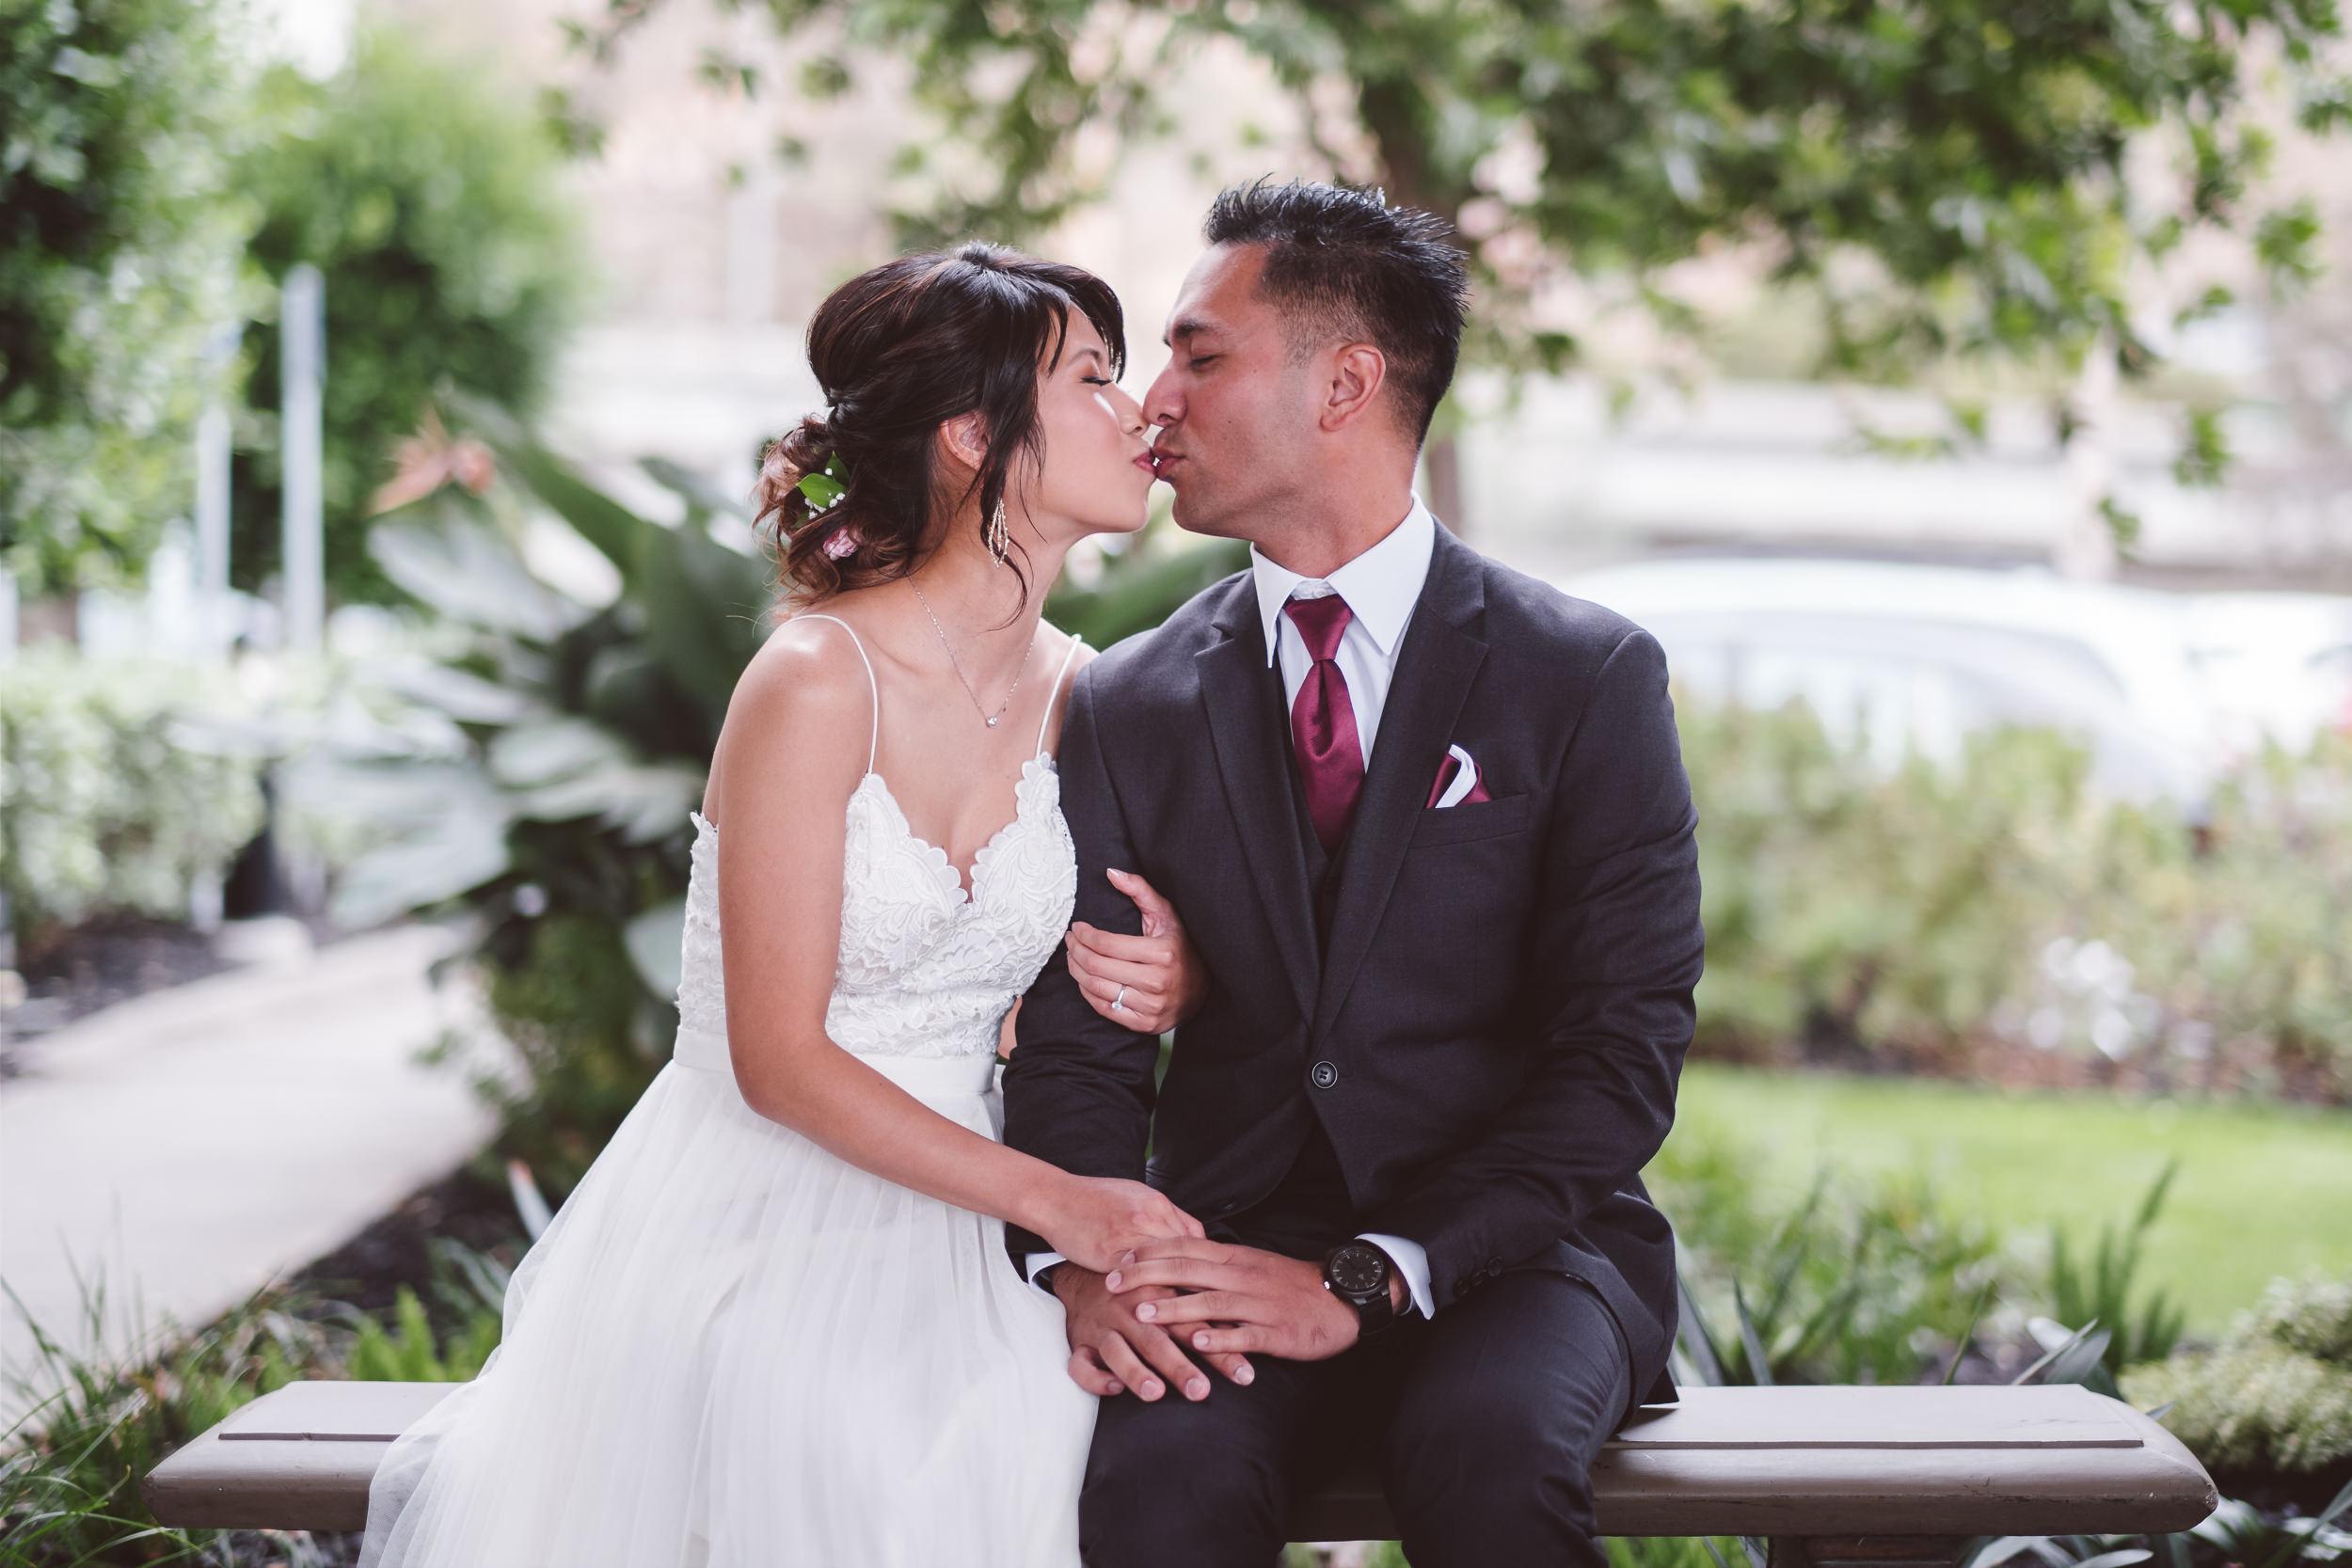 San-Francisco-City-Hall-Wedding-Photography-036.jpg